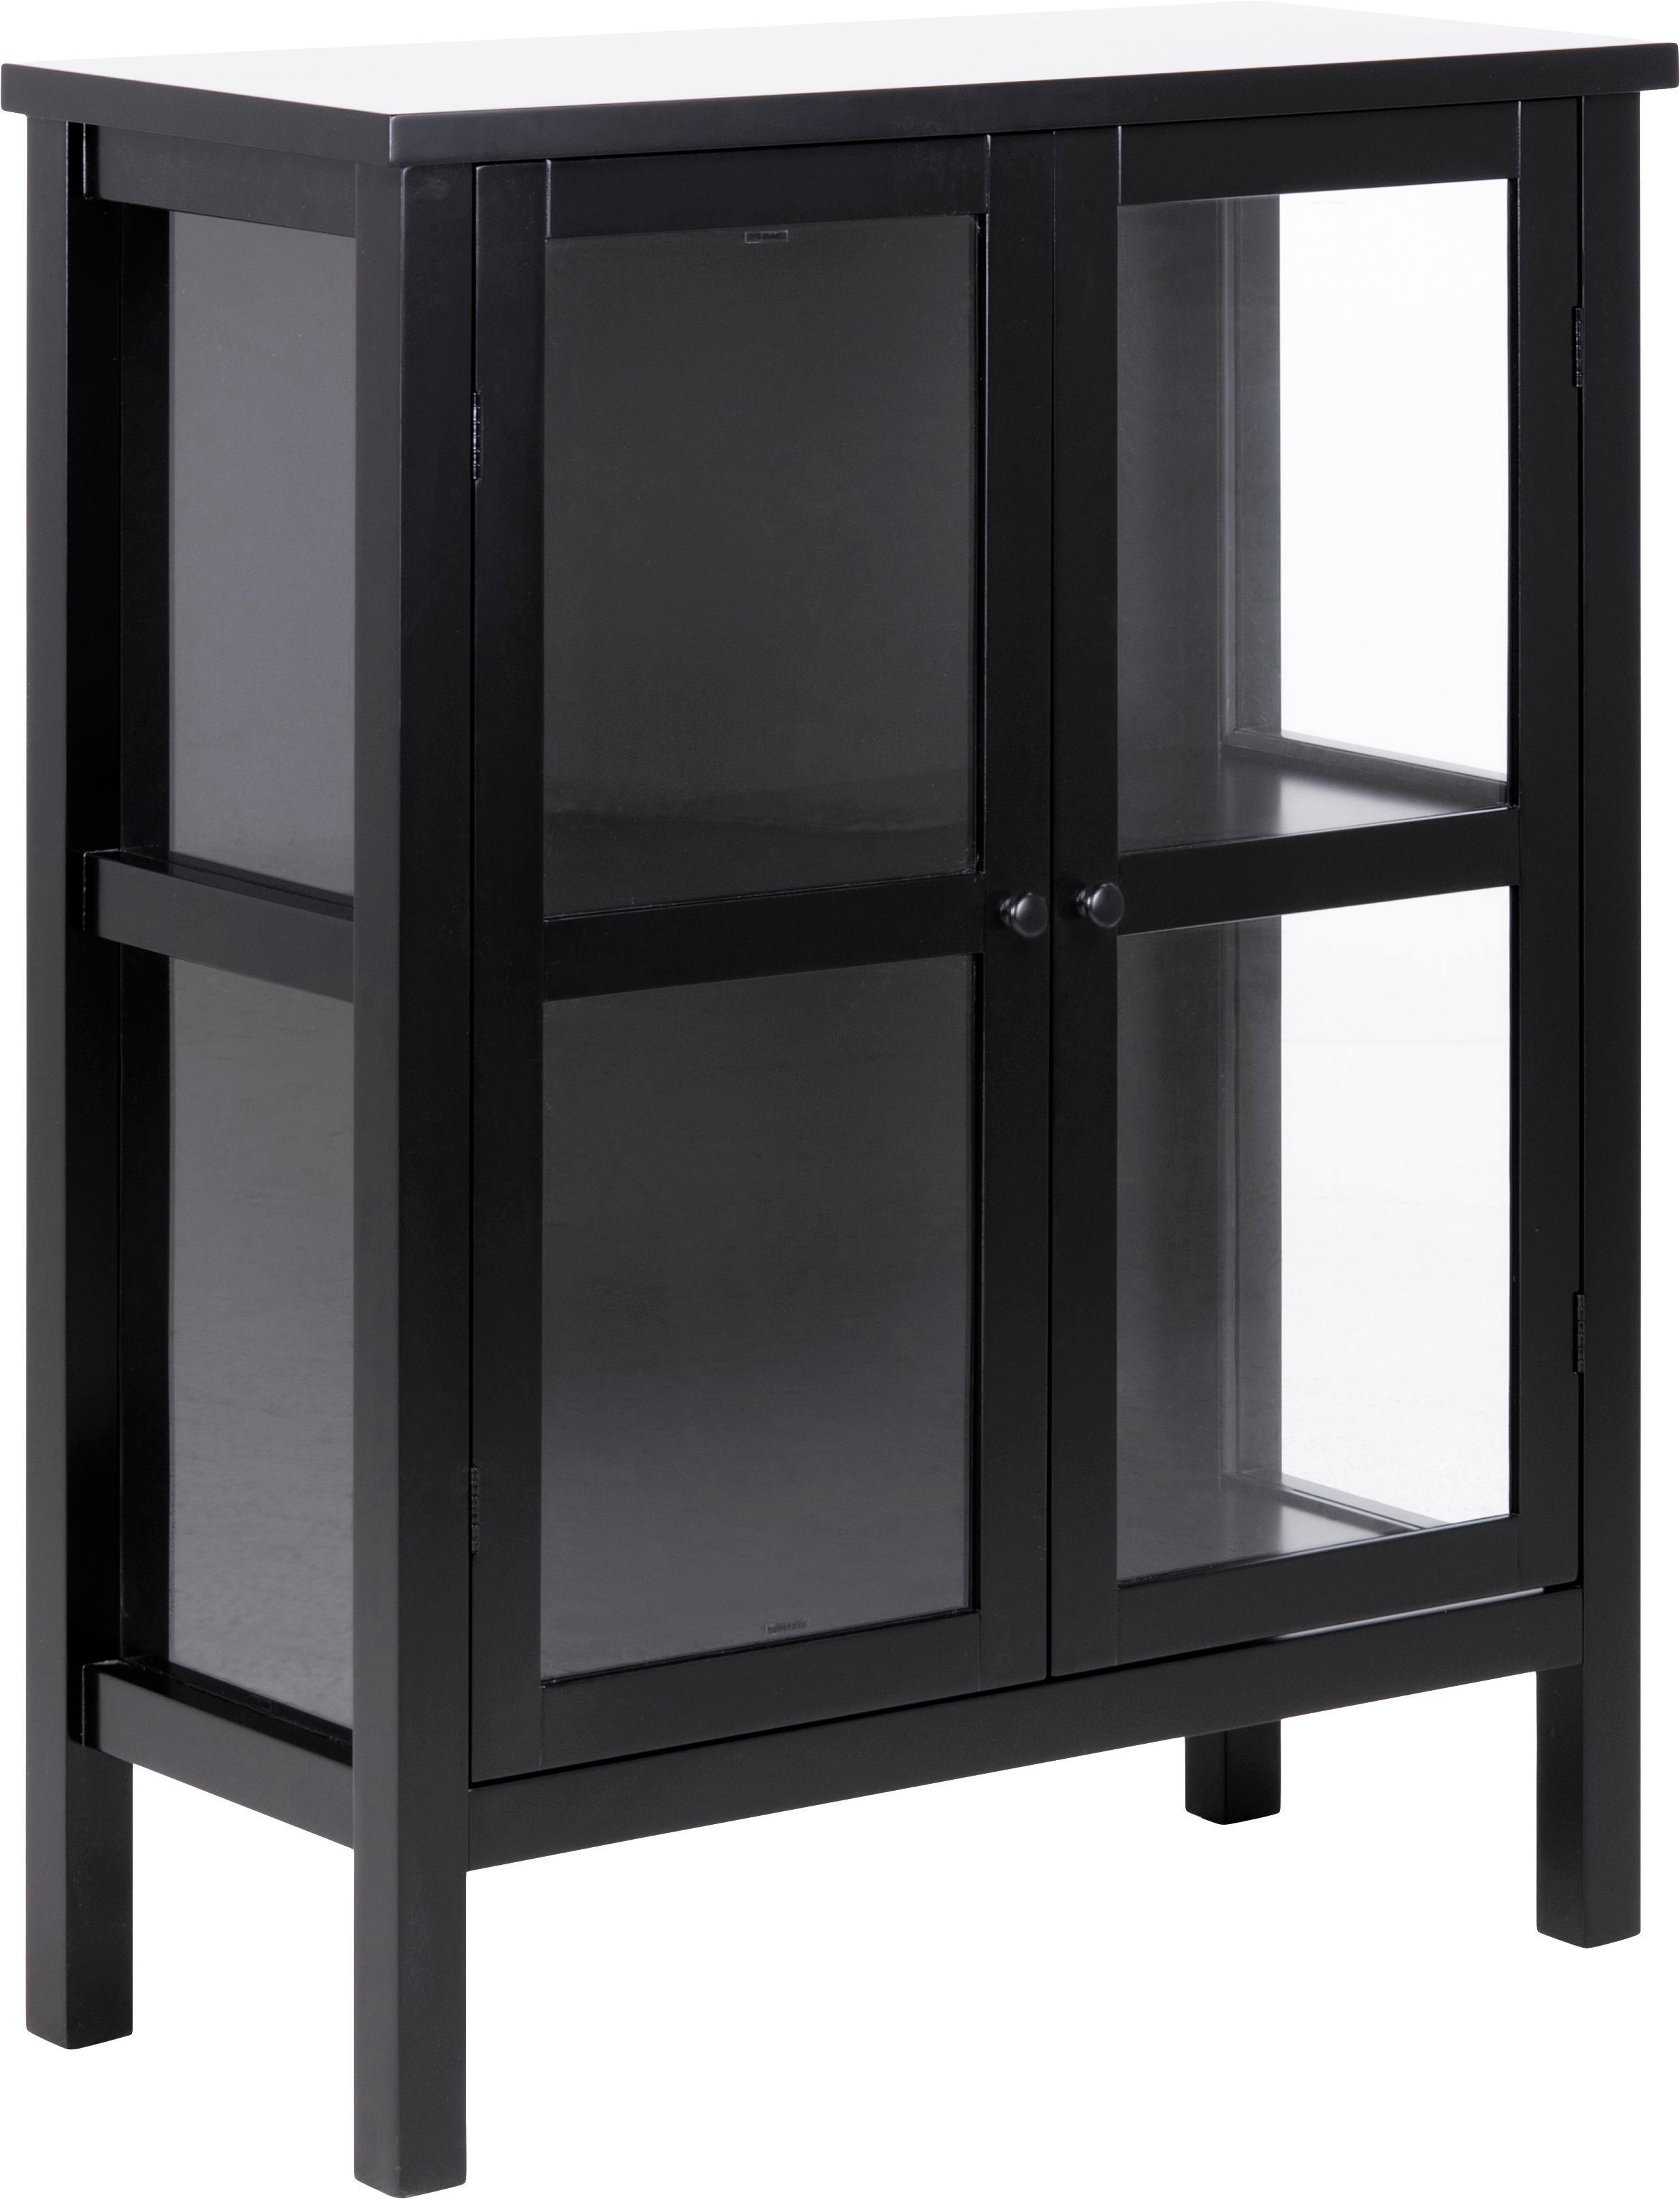 Vitrina Eton, Estructura: tablero de fibras de dens, Negro, An 80 x Al 100 cm